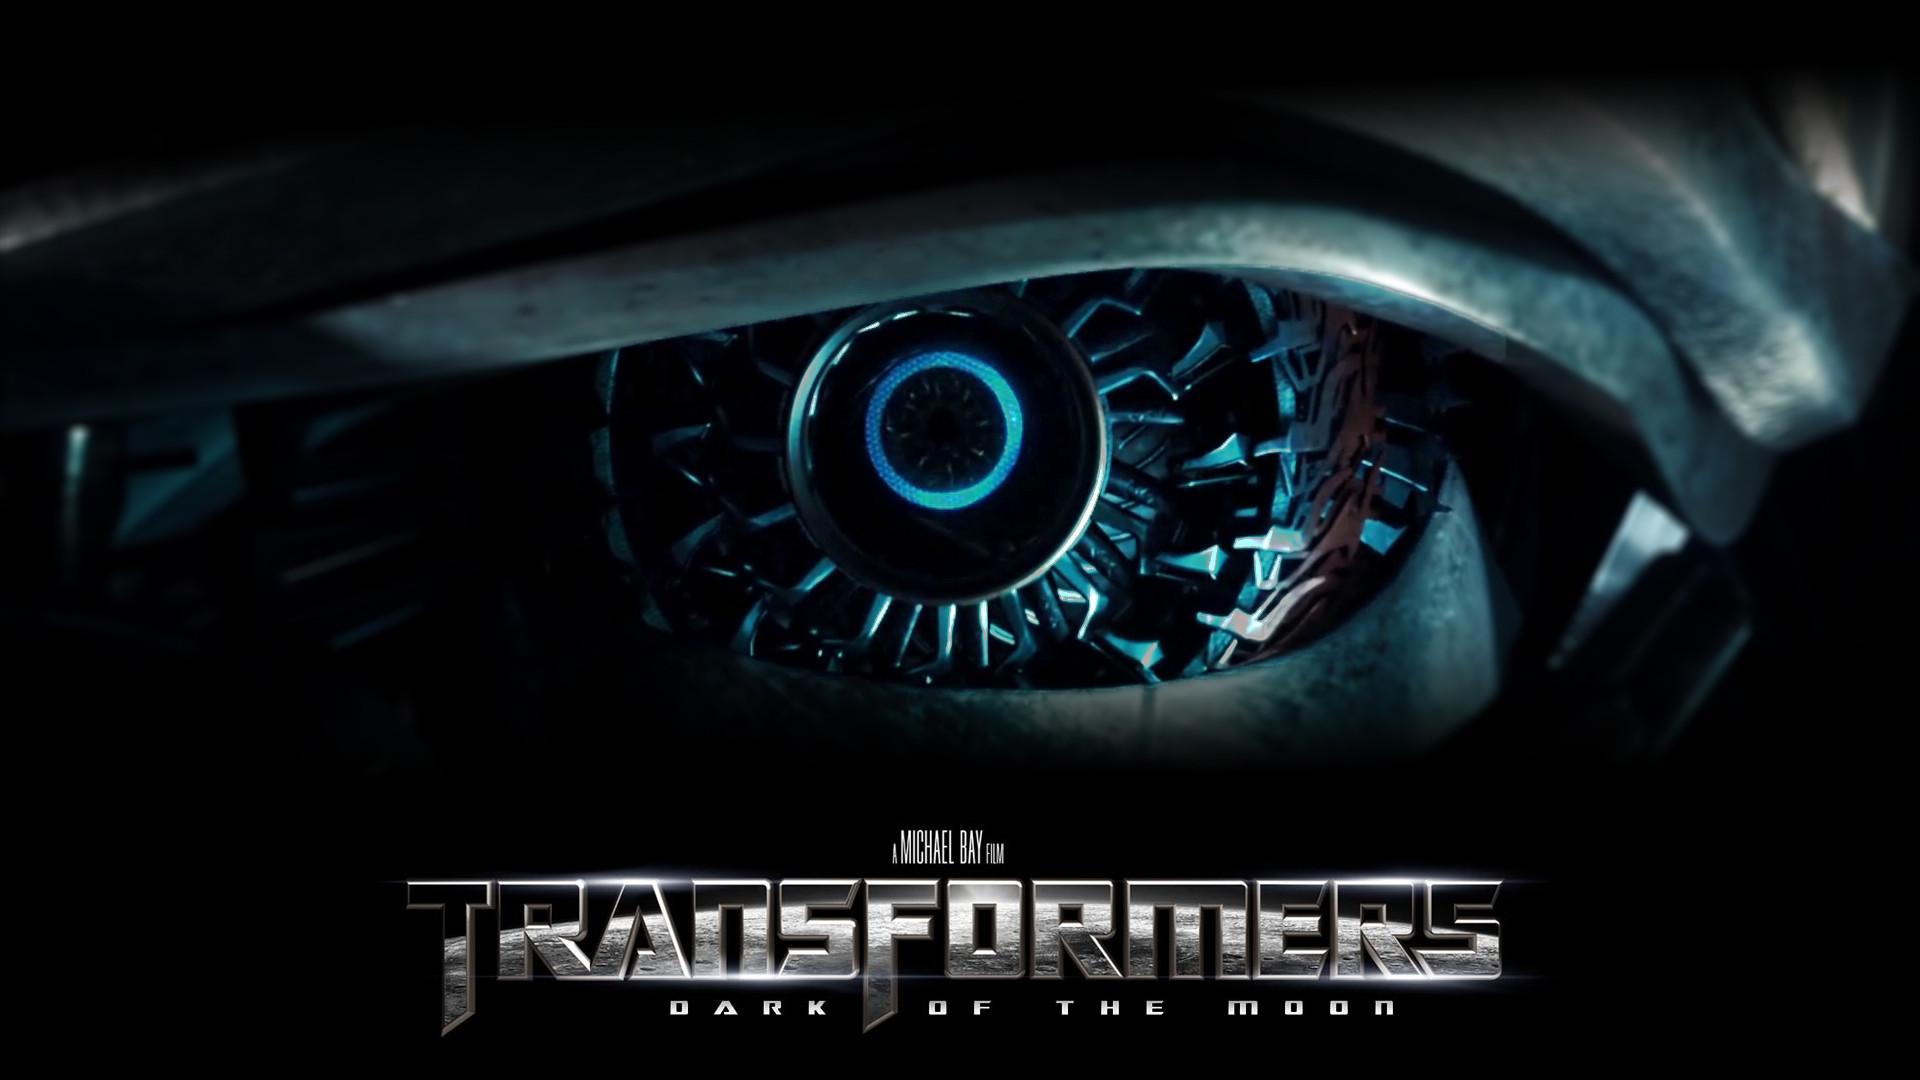 … Transformers: Dark of the Moon Eye Wallpaper by iNasko